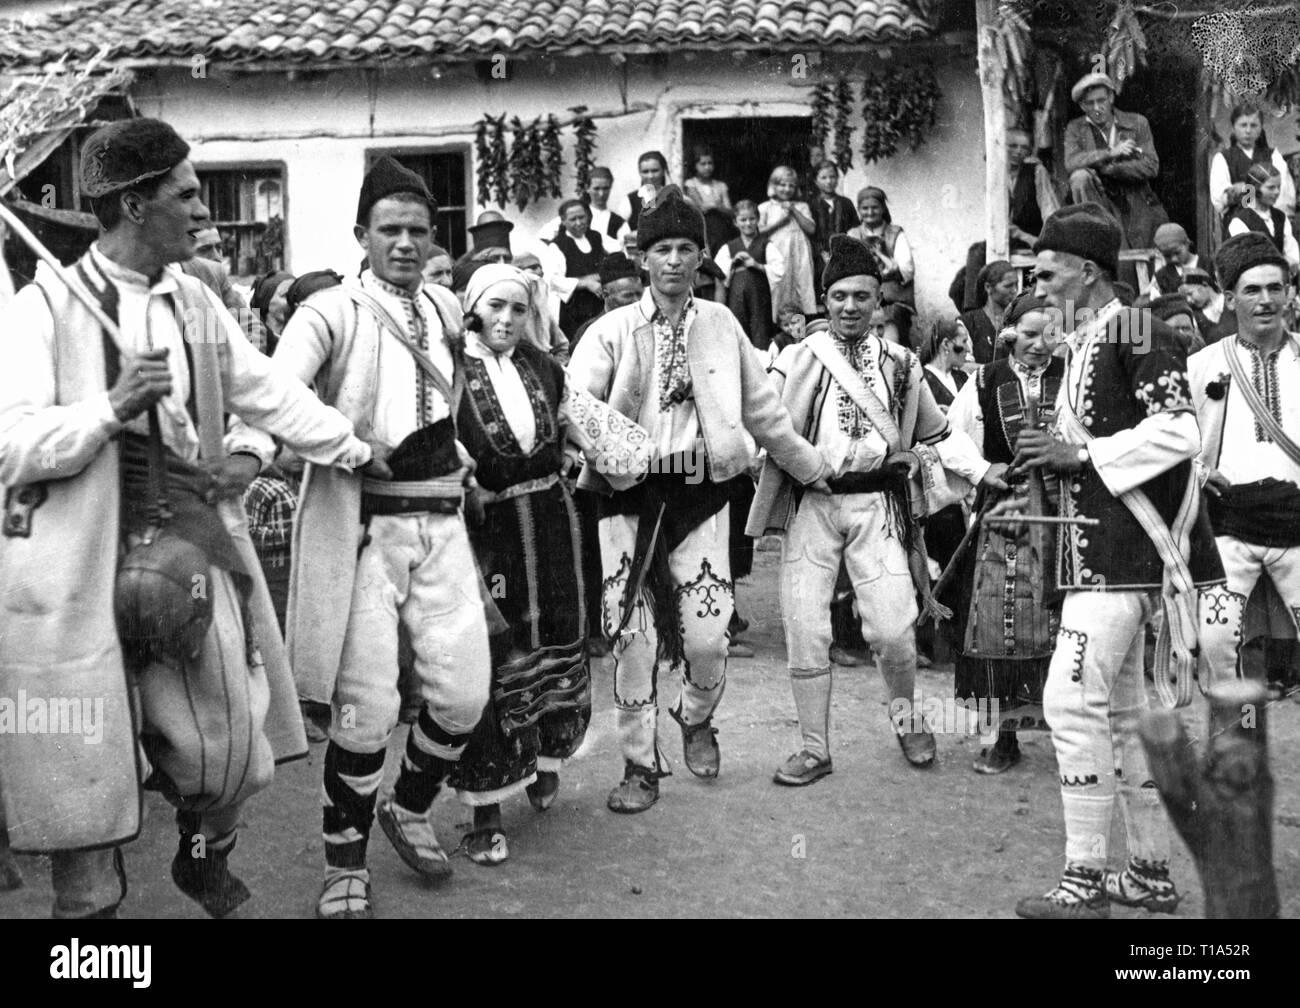 Geographie/Reisen historische, Bulgarien, Folklore, Volkstanz, circa 1935, Additional-Rights - Clearance-Info - Not-Available Stockbild